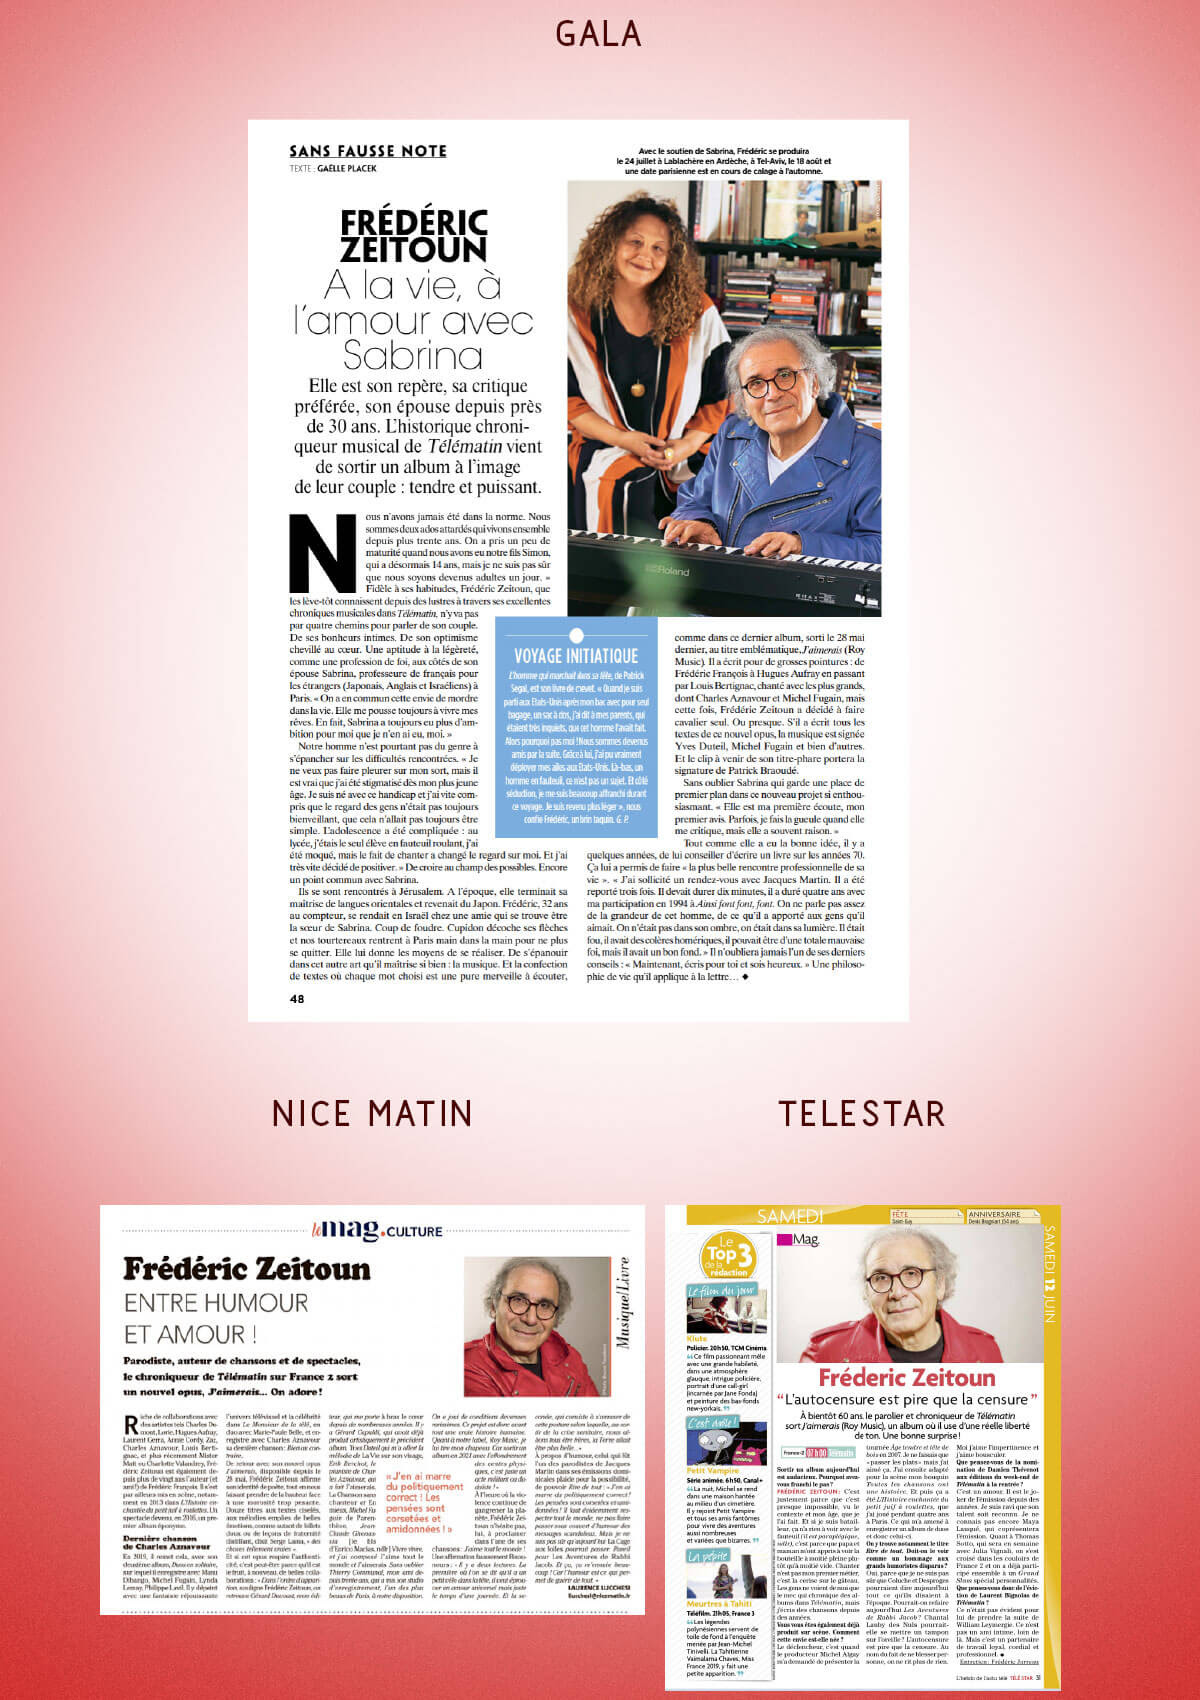 Articles dans Gala, Nice Matin et Telestar